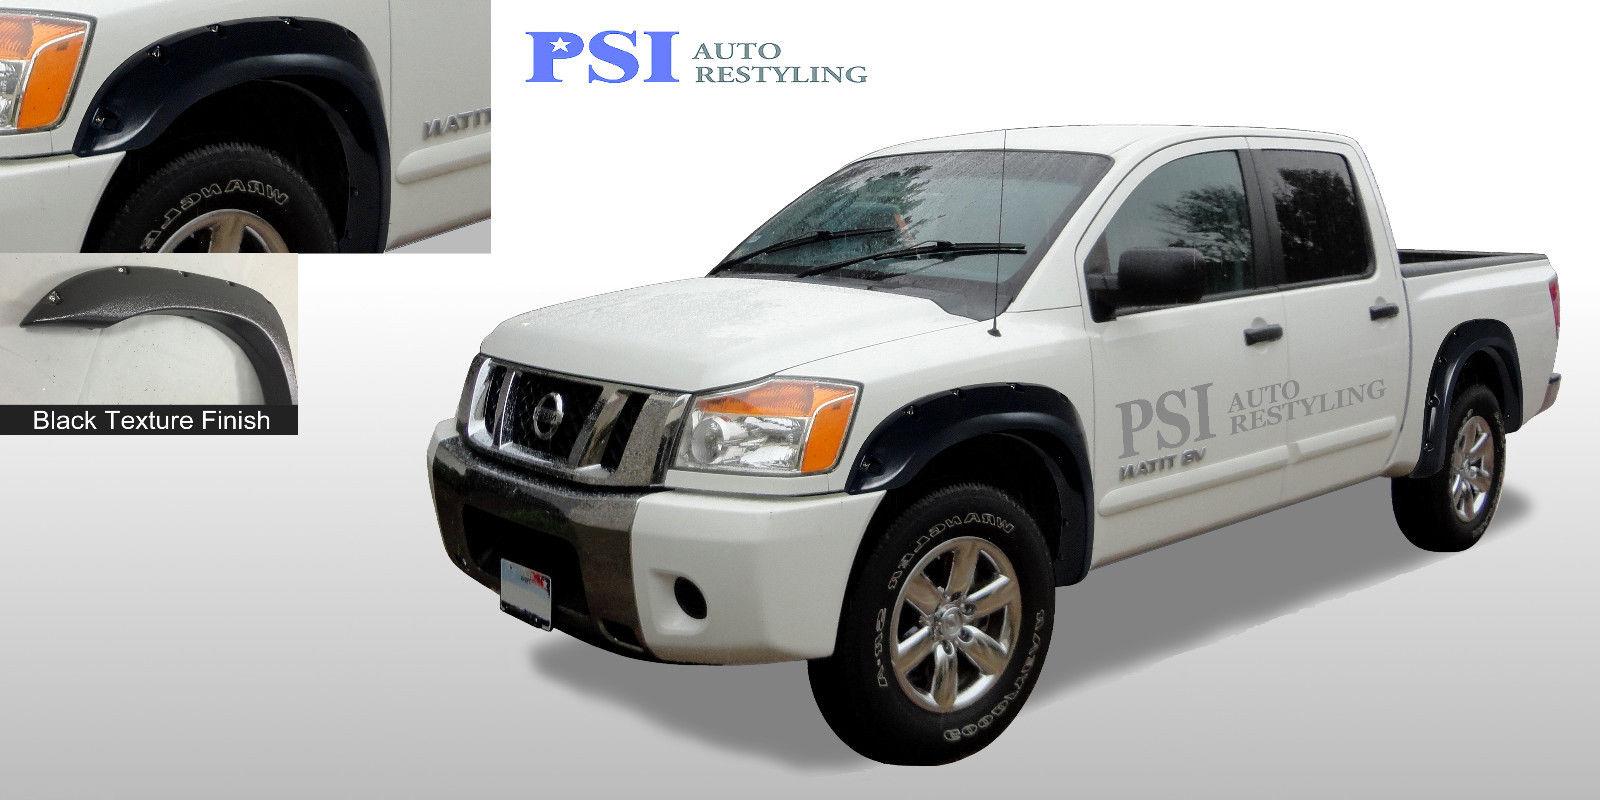 Nissan Titan I Restyling 2007 - 2015 Pickup #6